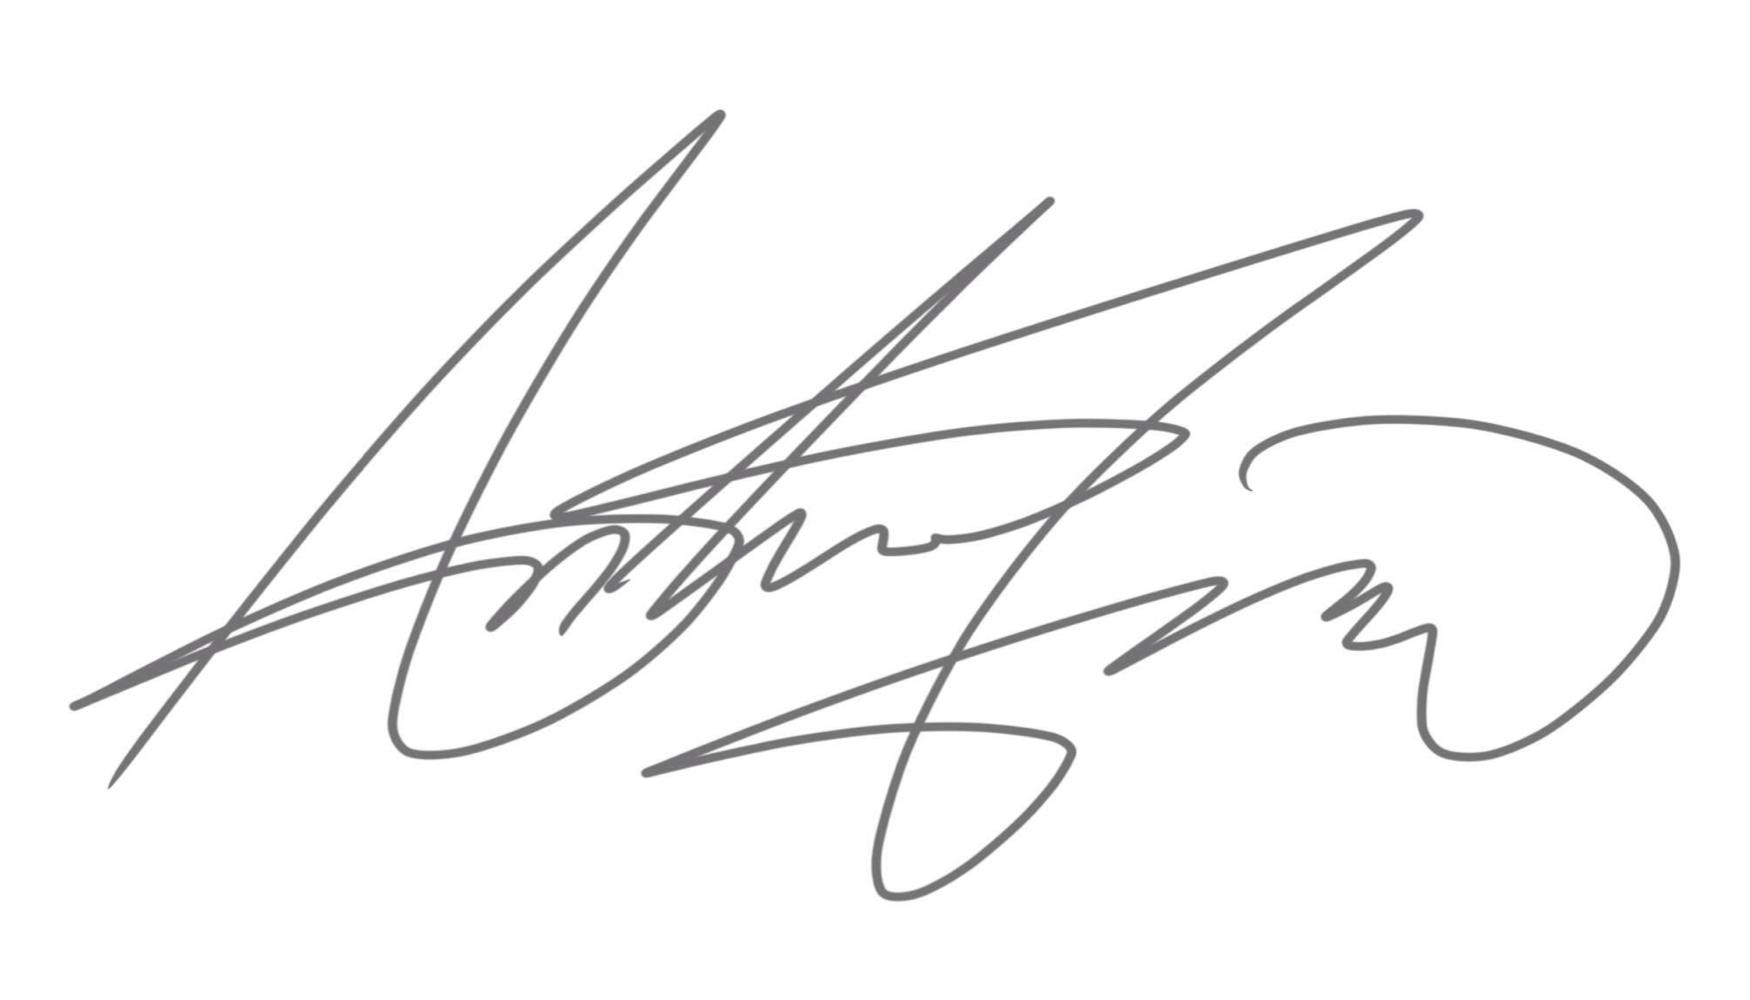 AndrewFrey-Signature.jpg